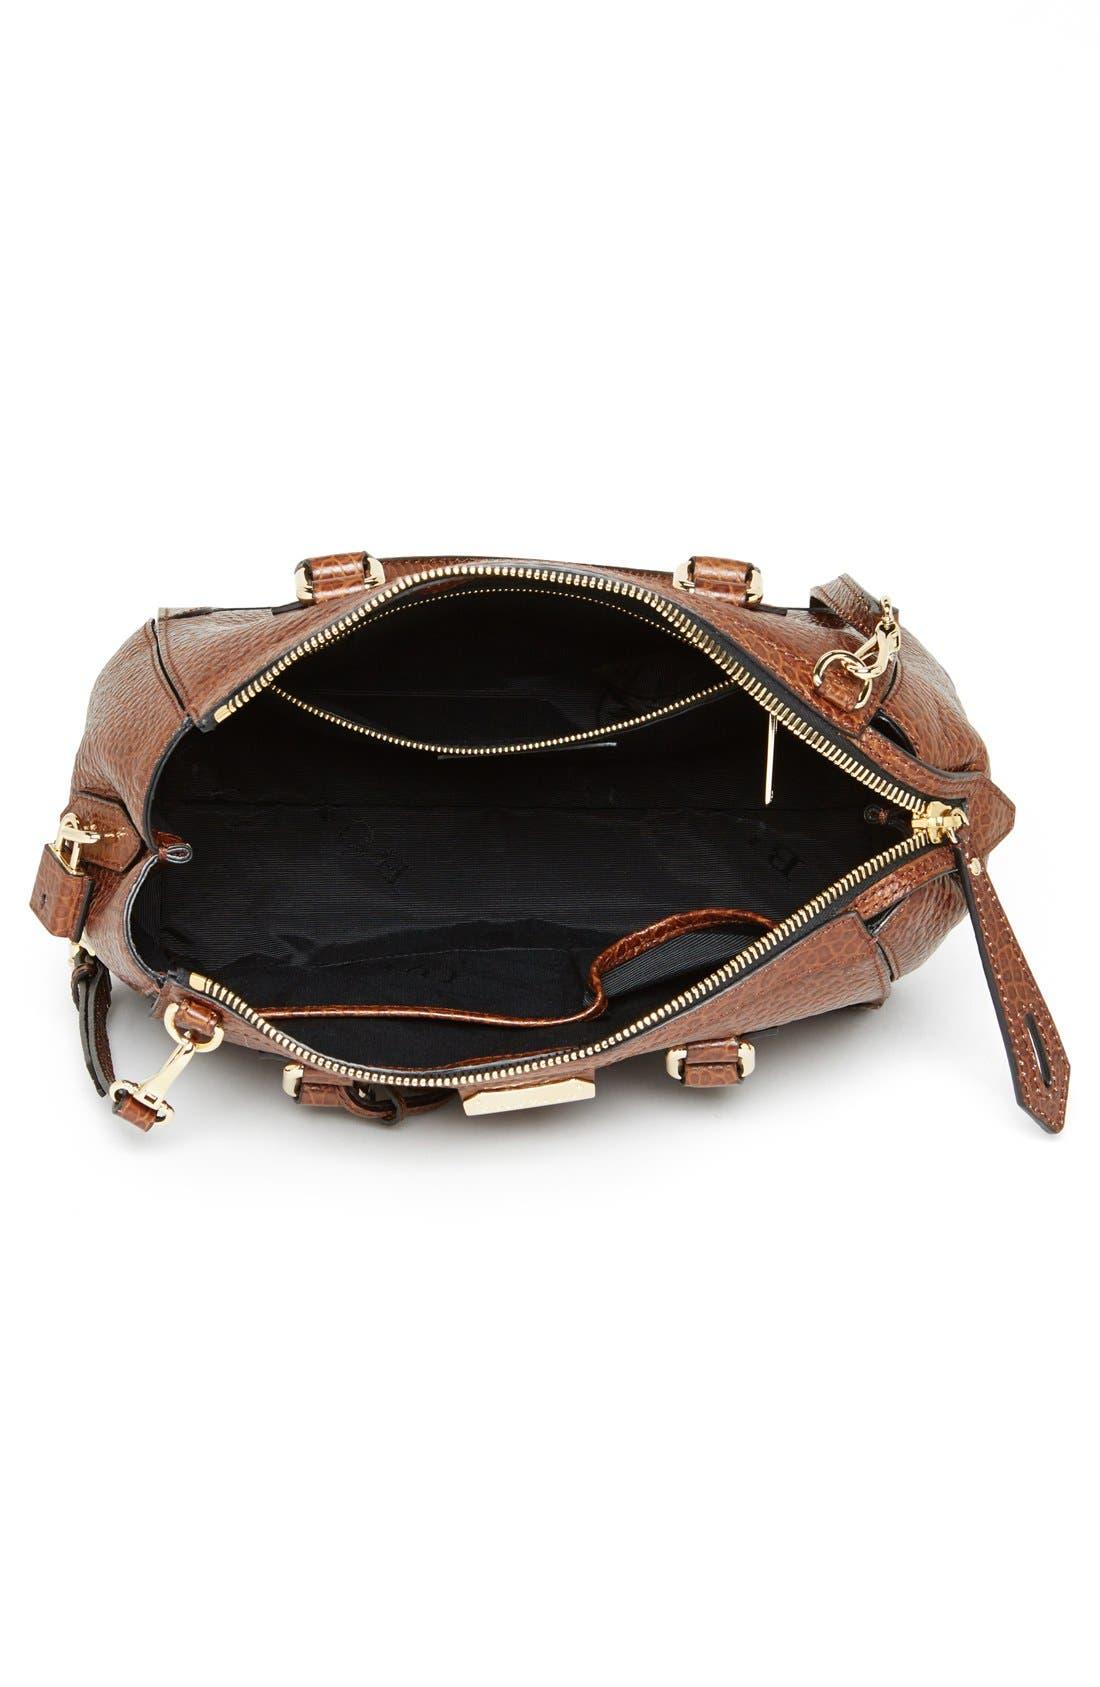 Alternate Image 3  - Burberry 'Small Gladstone' Leather Satchel